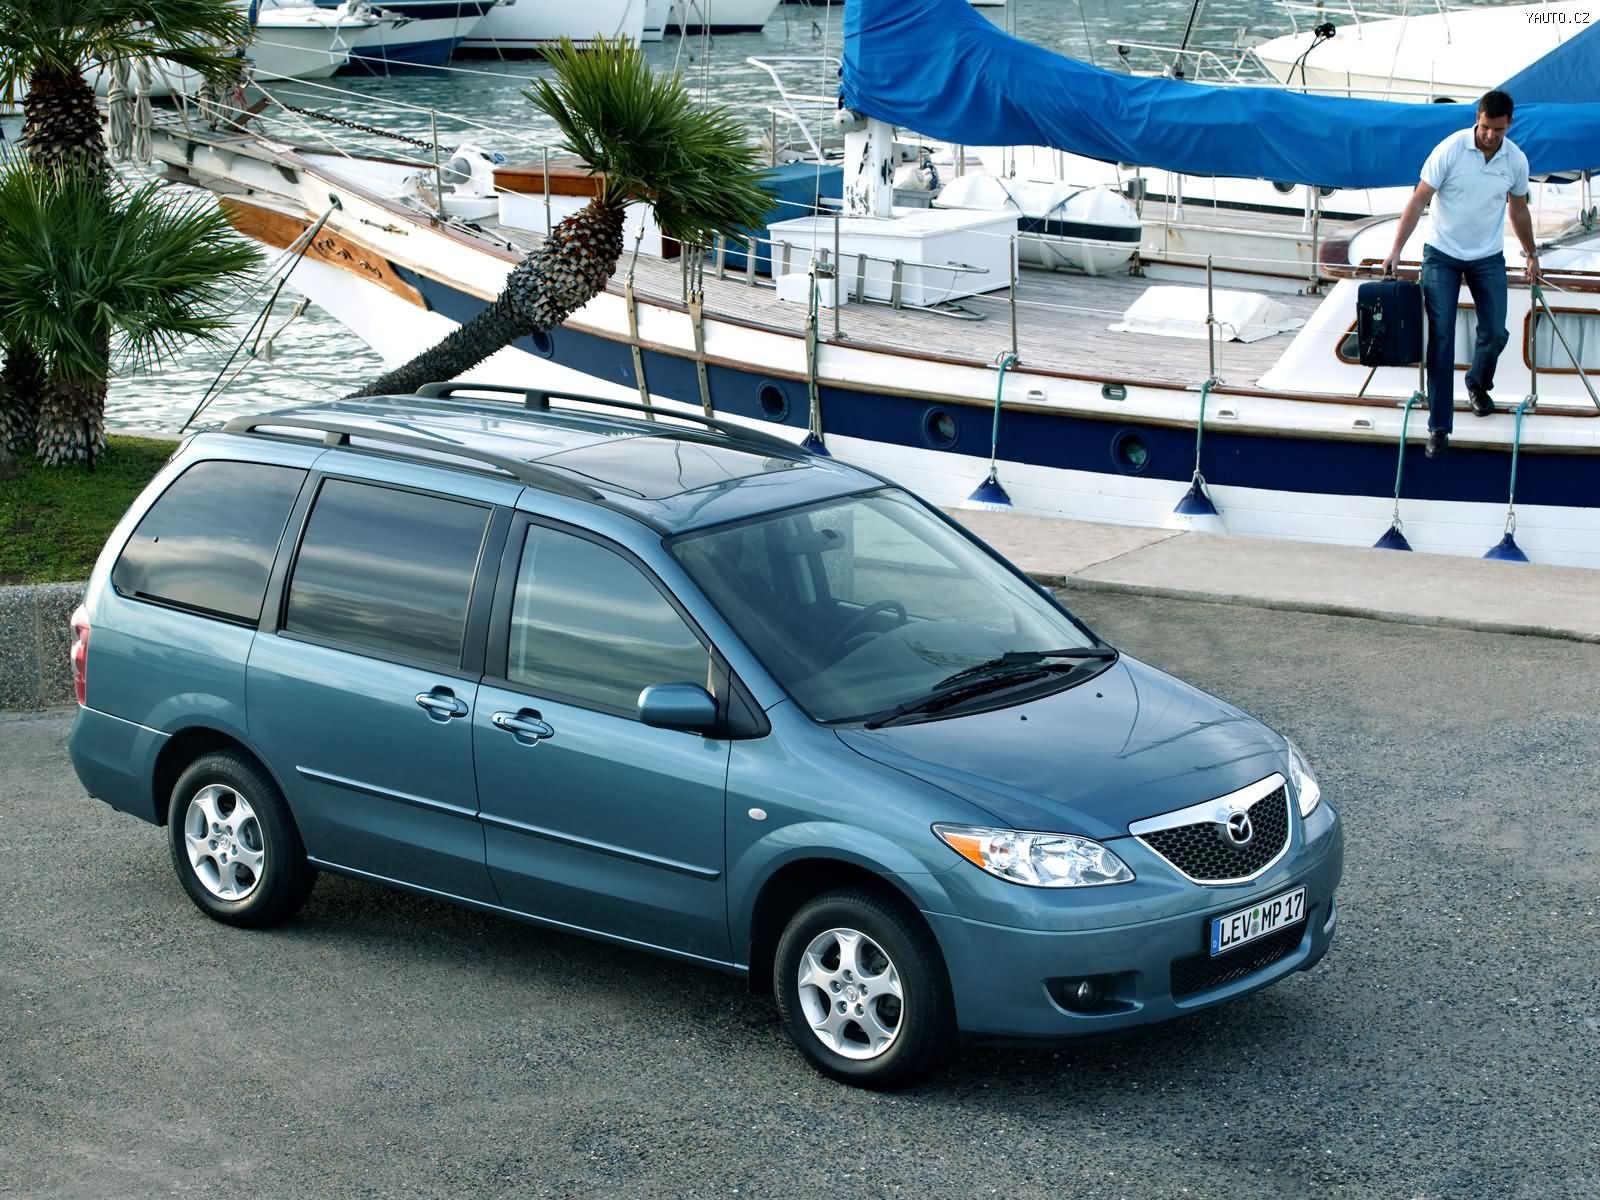 Mazda >> Mazda MPV (2004) Auta na plochu, tapety na plochu, wallpapers